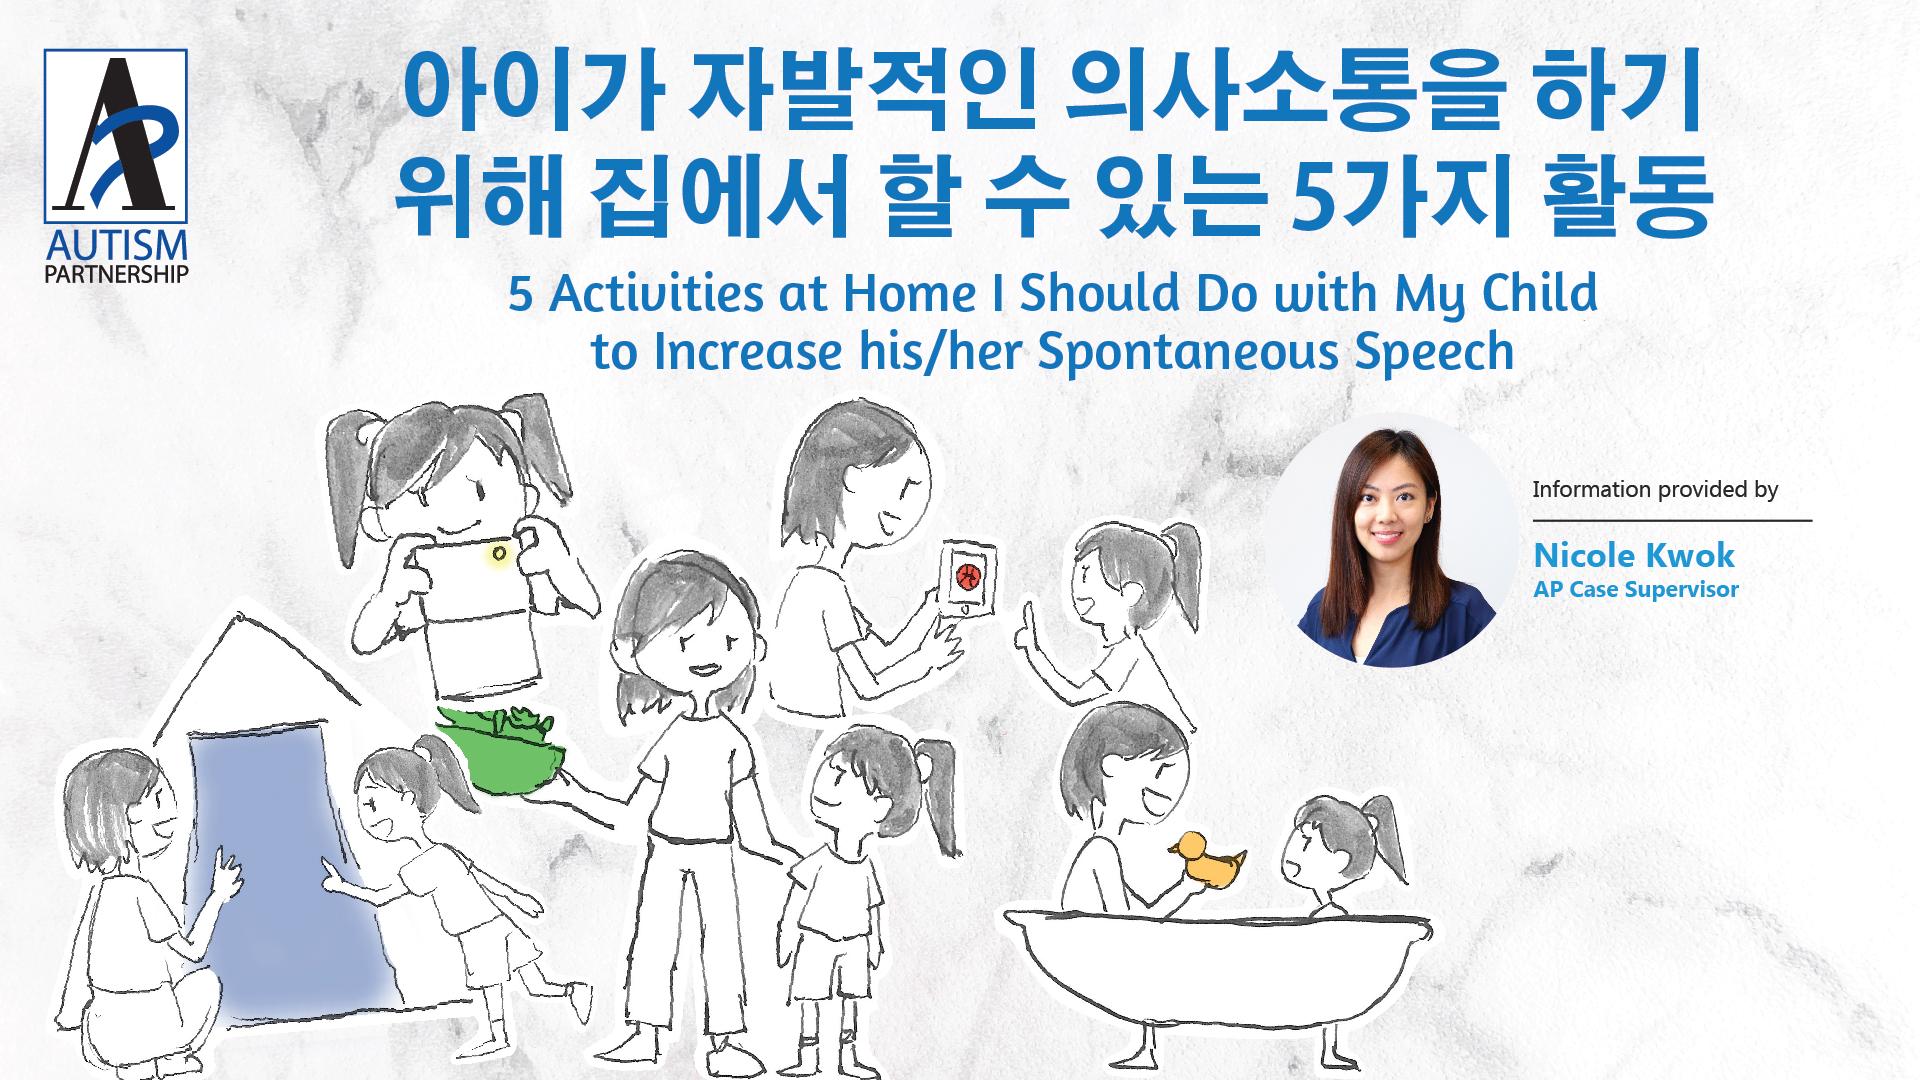 article-banner_5-activities-to-increase-speech_kr-01